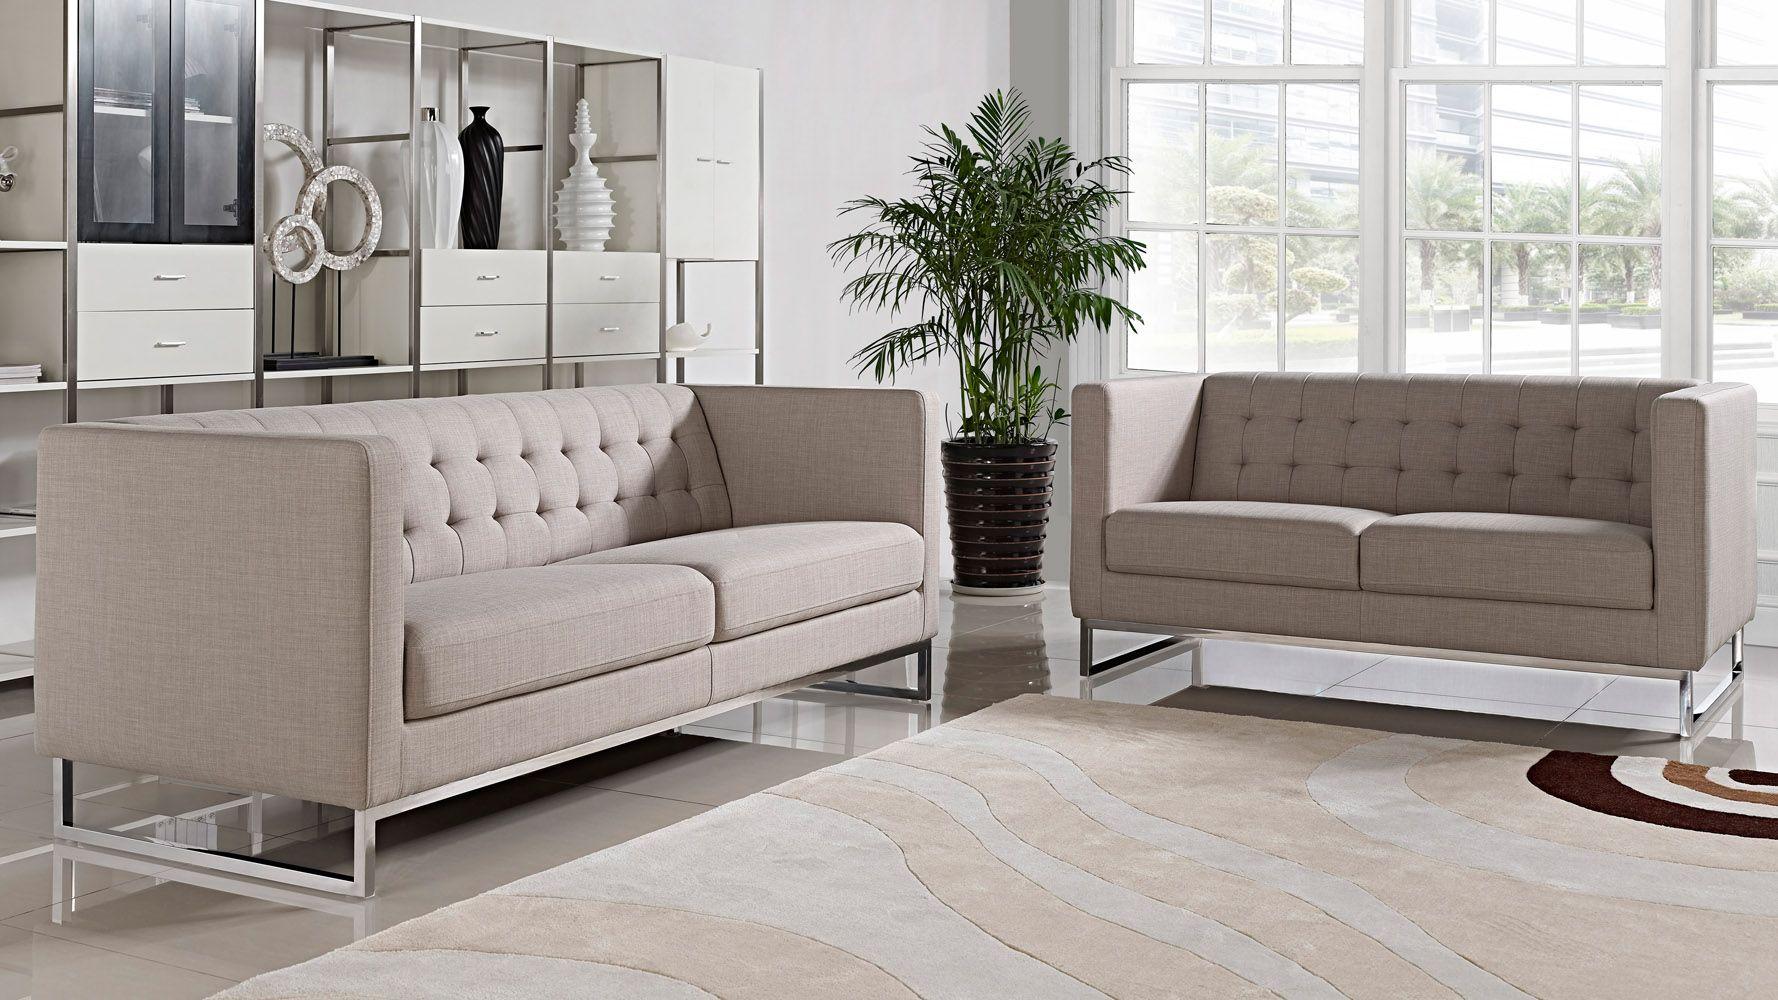 Alpha Sofa And Loveseat Set Sofa Set Sofa And Loveseat Set Furniture